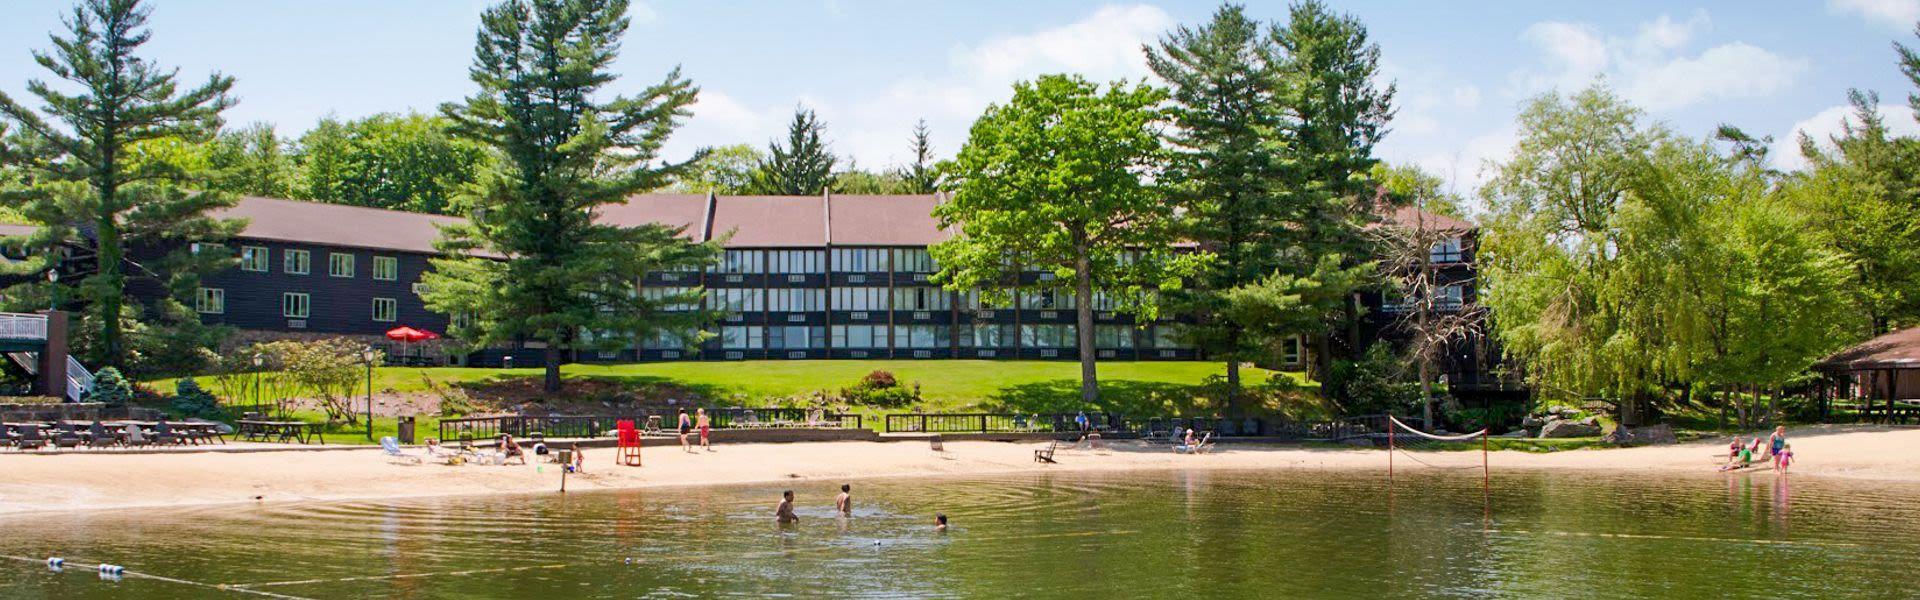 Split Rock Resort In Beautiful Lake Harmony Pennsylvania Embraces All The Ways Beauty Blended With Festivities Comes To B Poconos Resort Lake Harmony Poconos